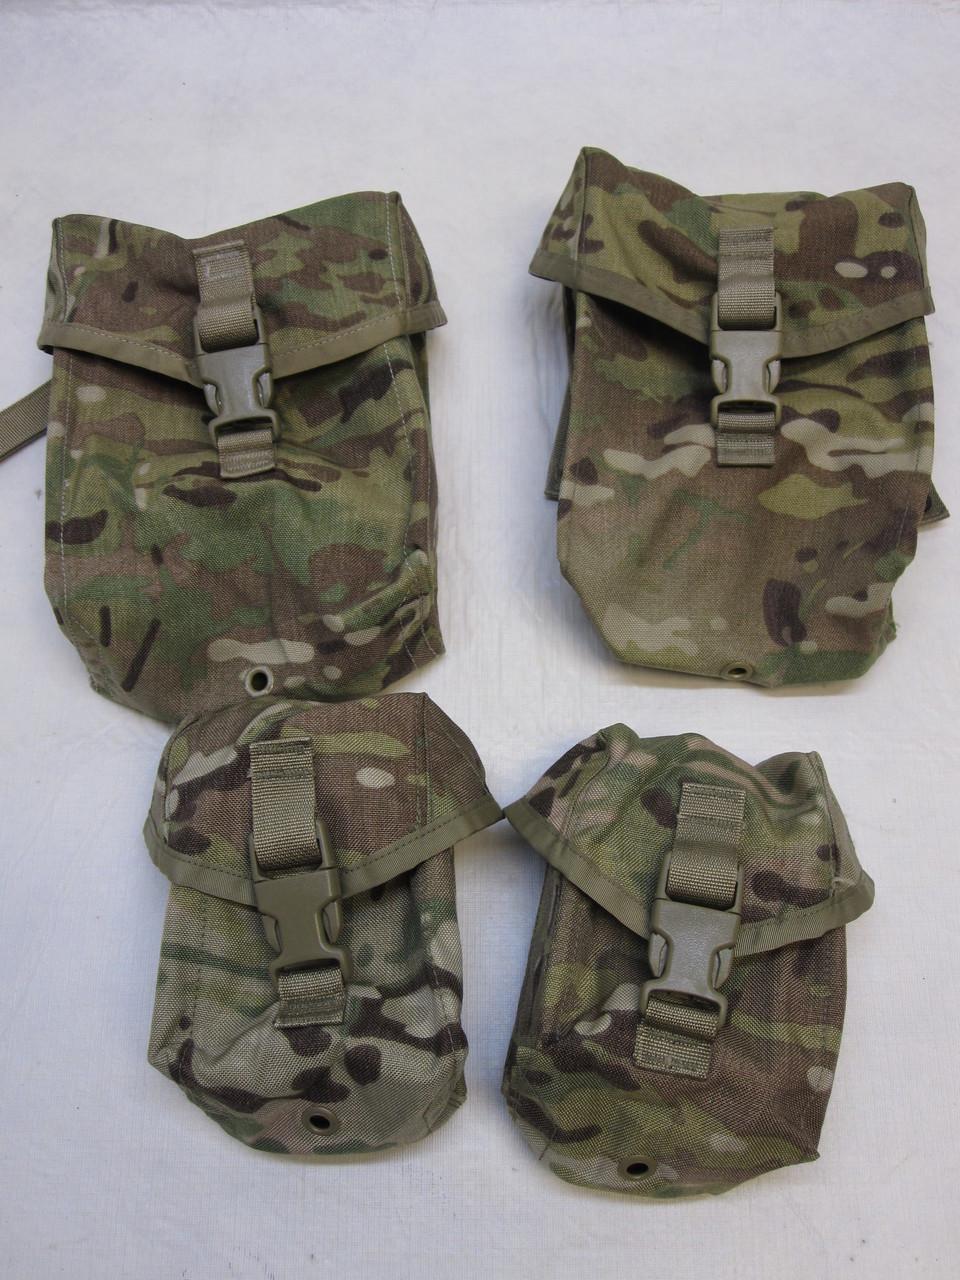 ARMY OCP MULTICAM SAW GUNNERS MOLLE POUCH SET (2) 100 RND & (2) 200 RND cO